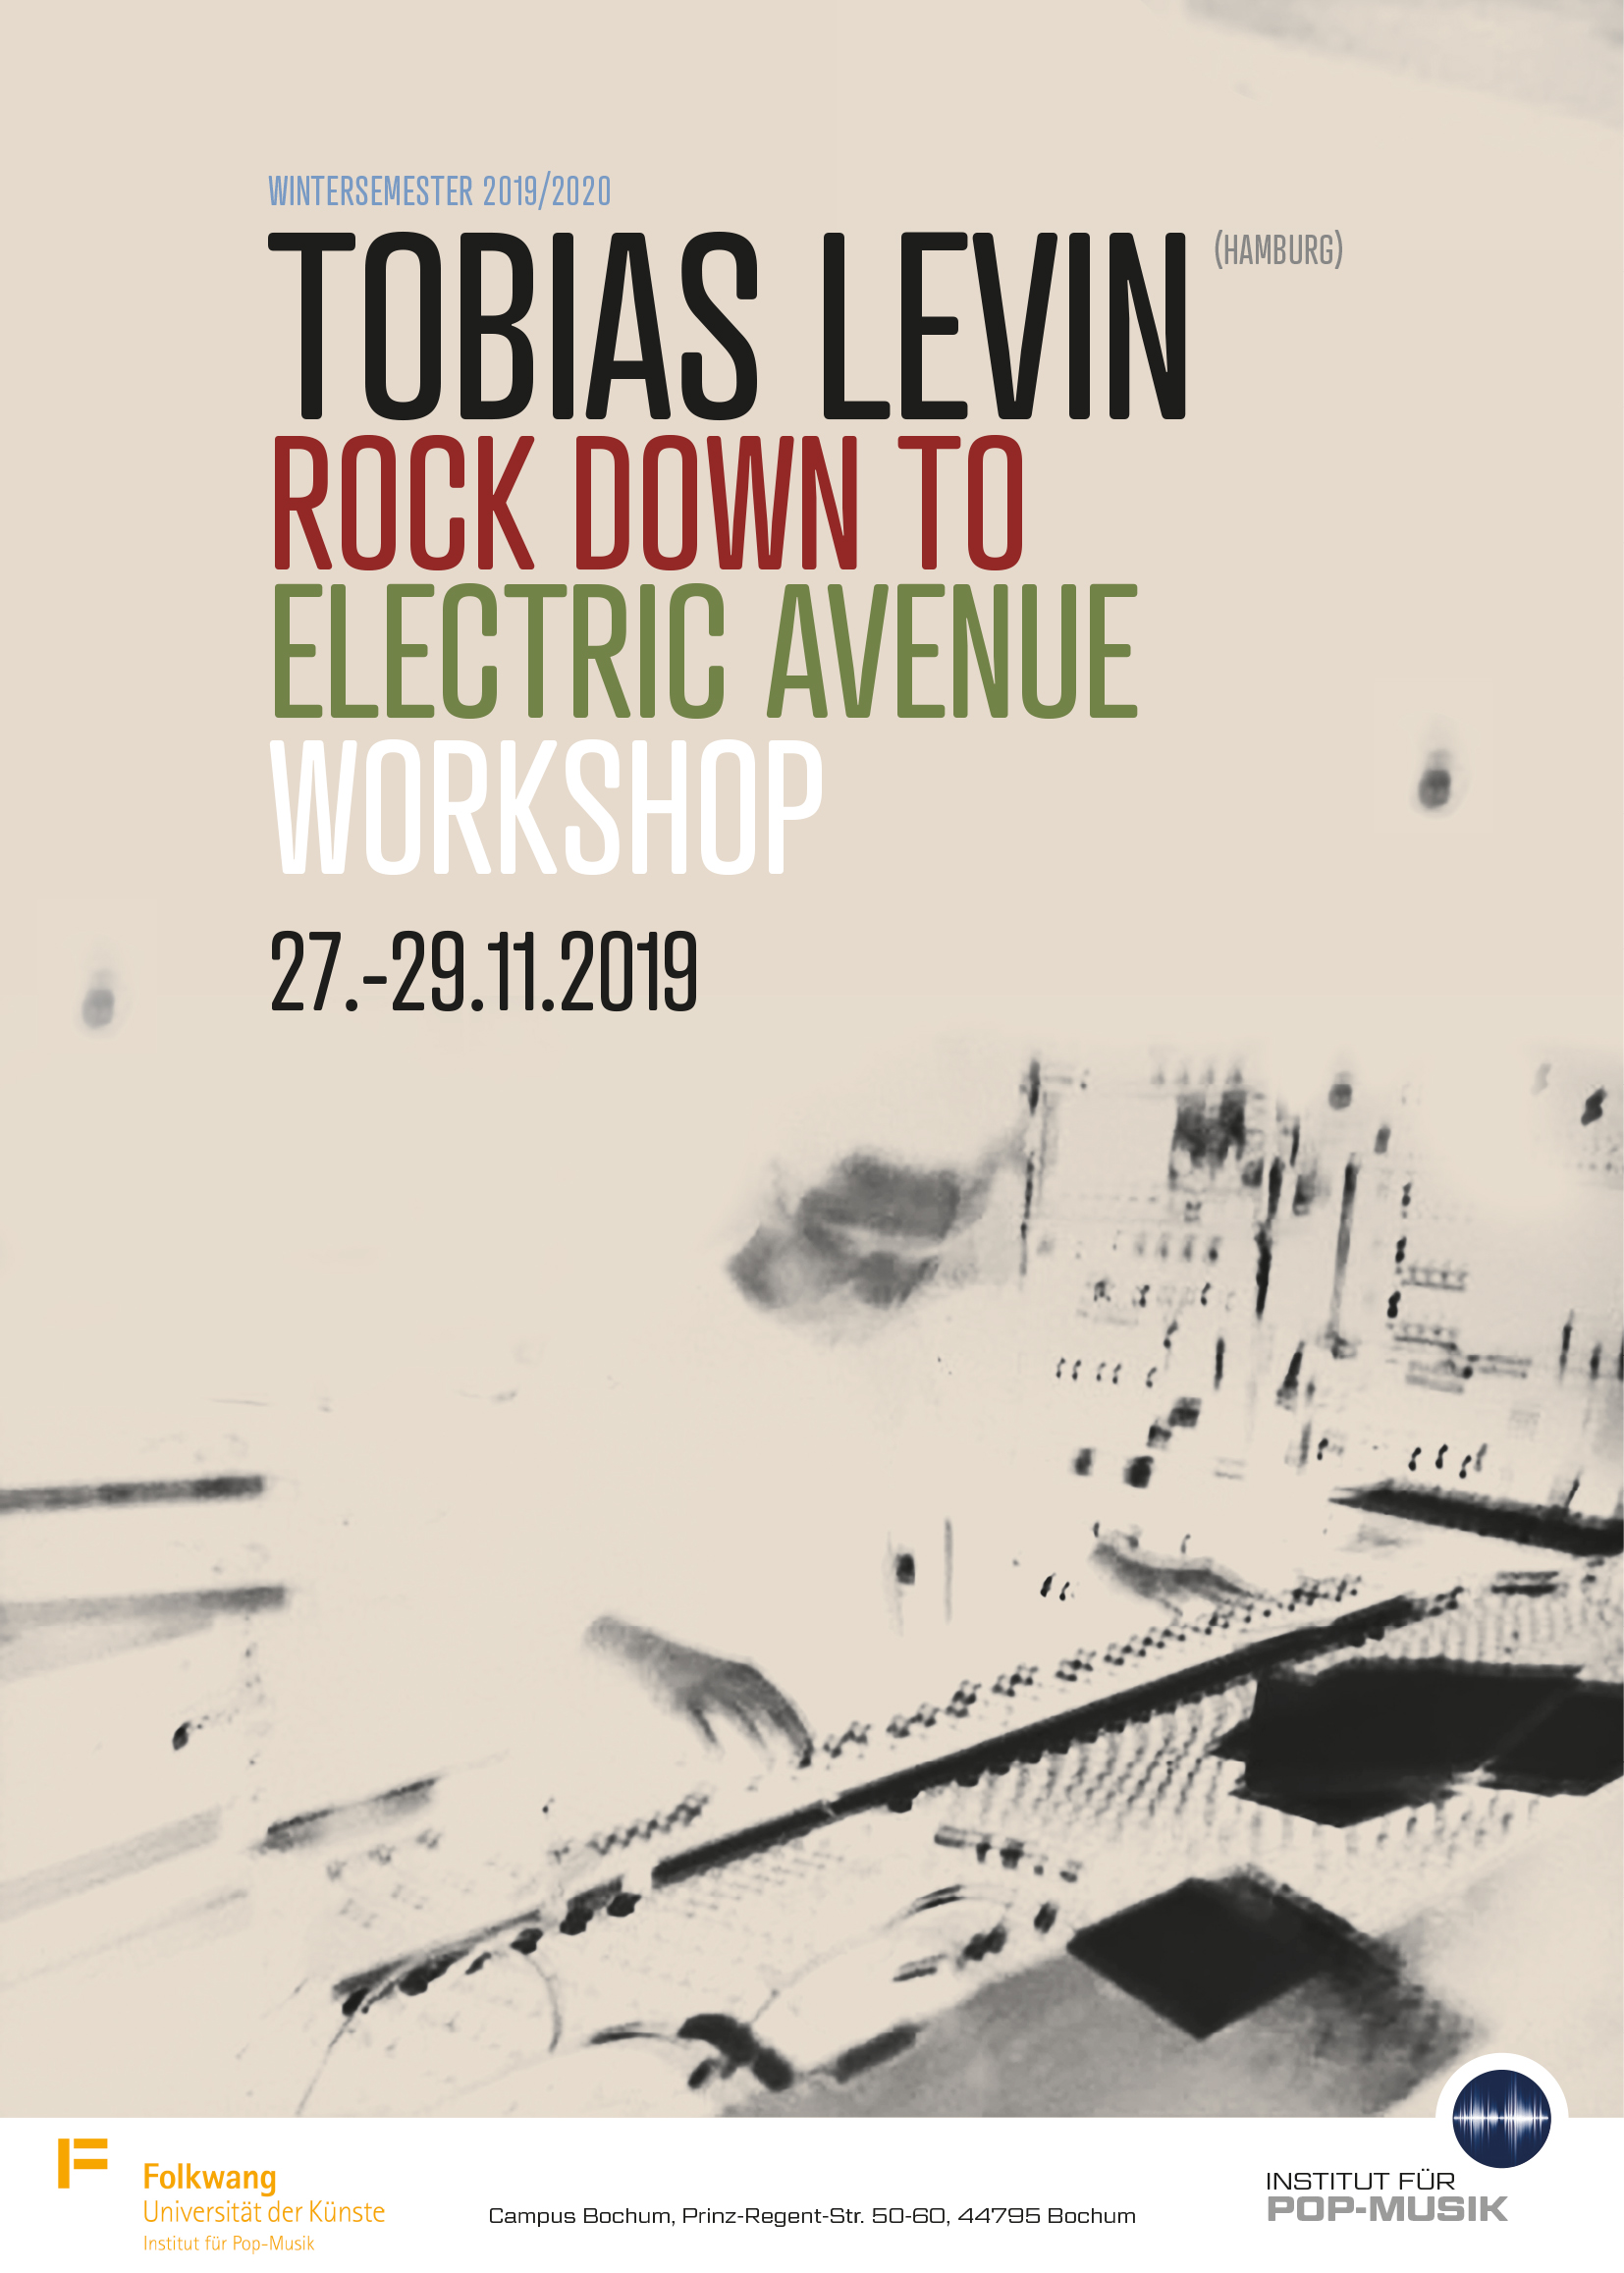 Tobias Levin - Rock Down to Electric Avenue